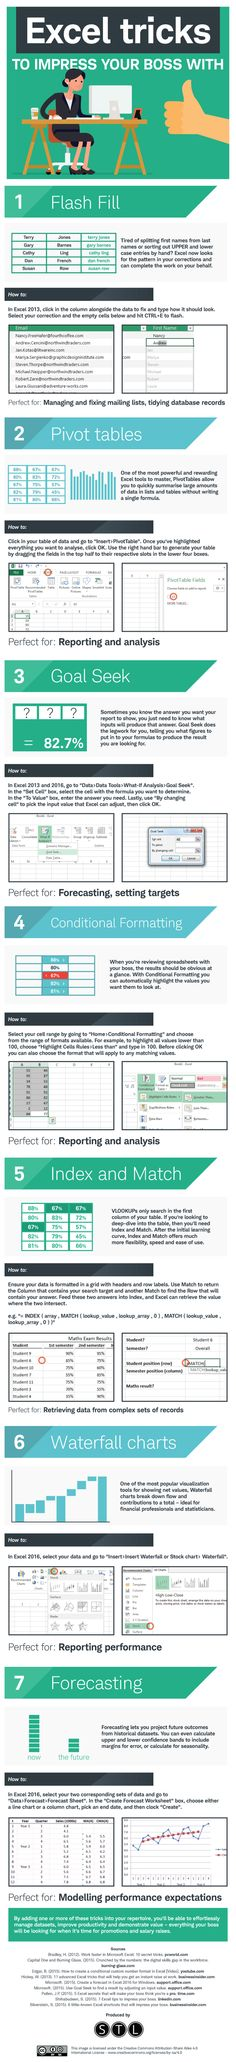 Excel at Excel - Album on Imgur